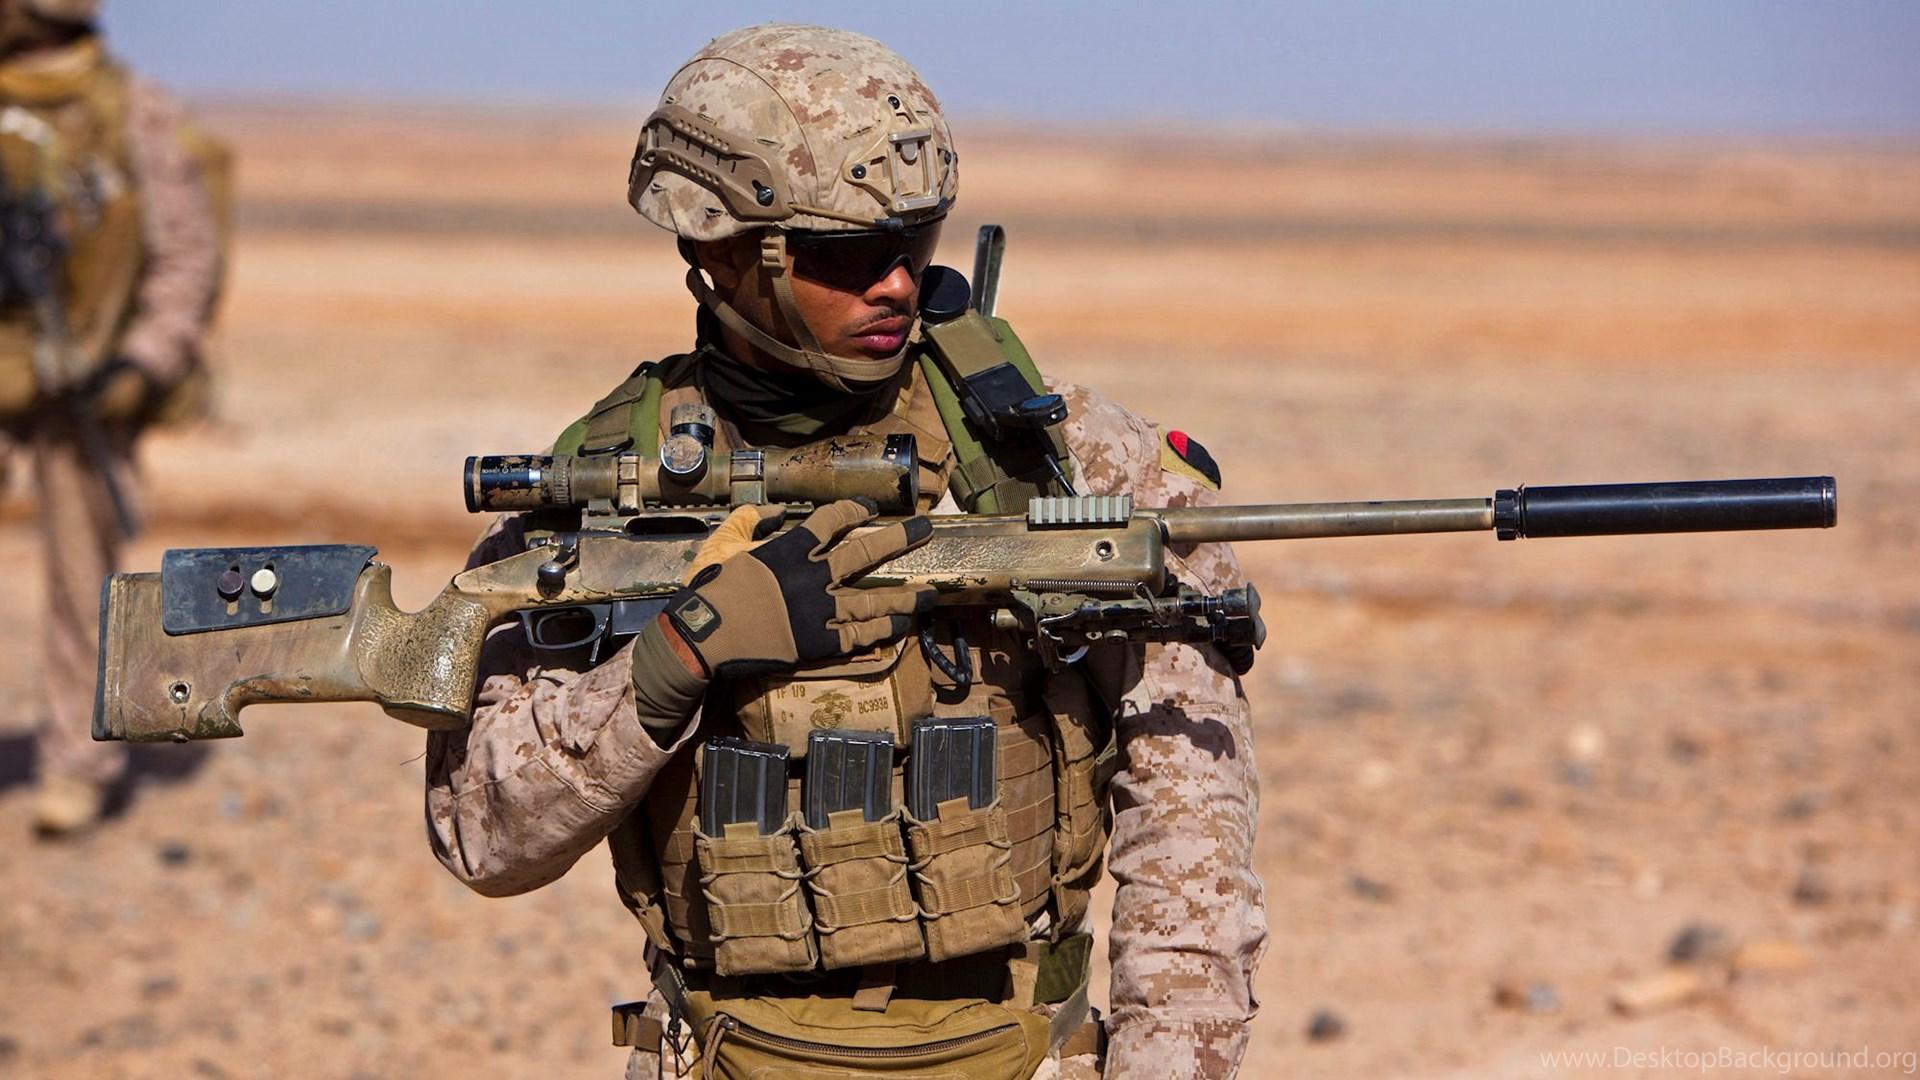 Usmc Scout Sniper Wallpapers Desktop Background